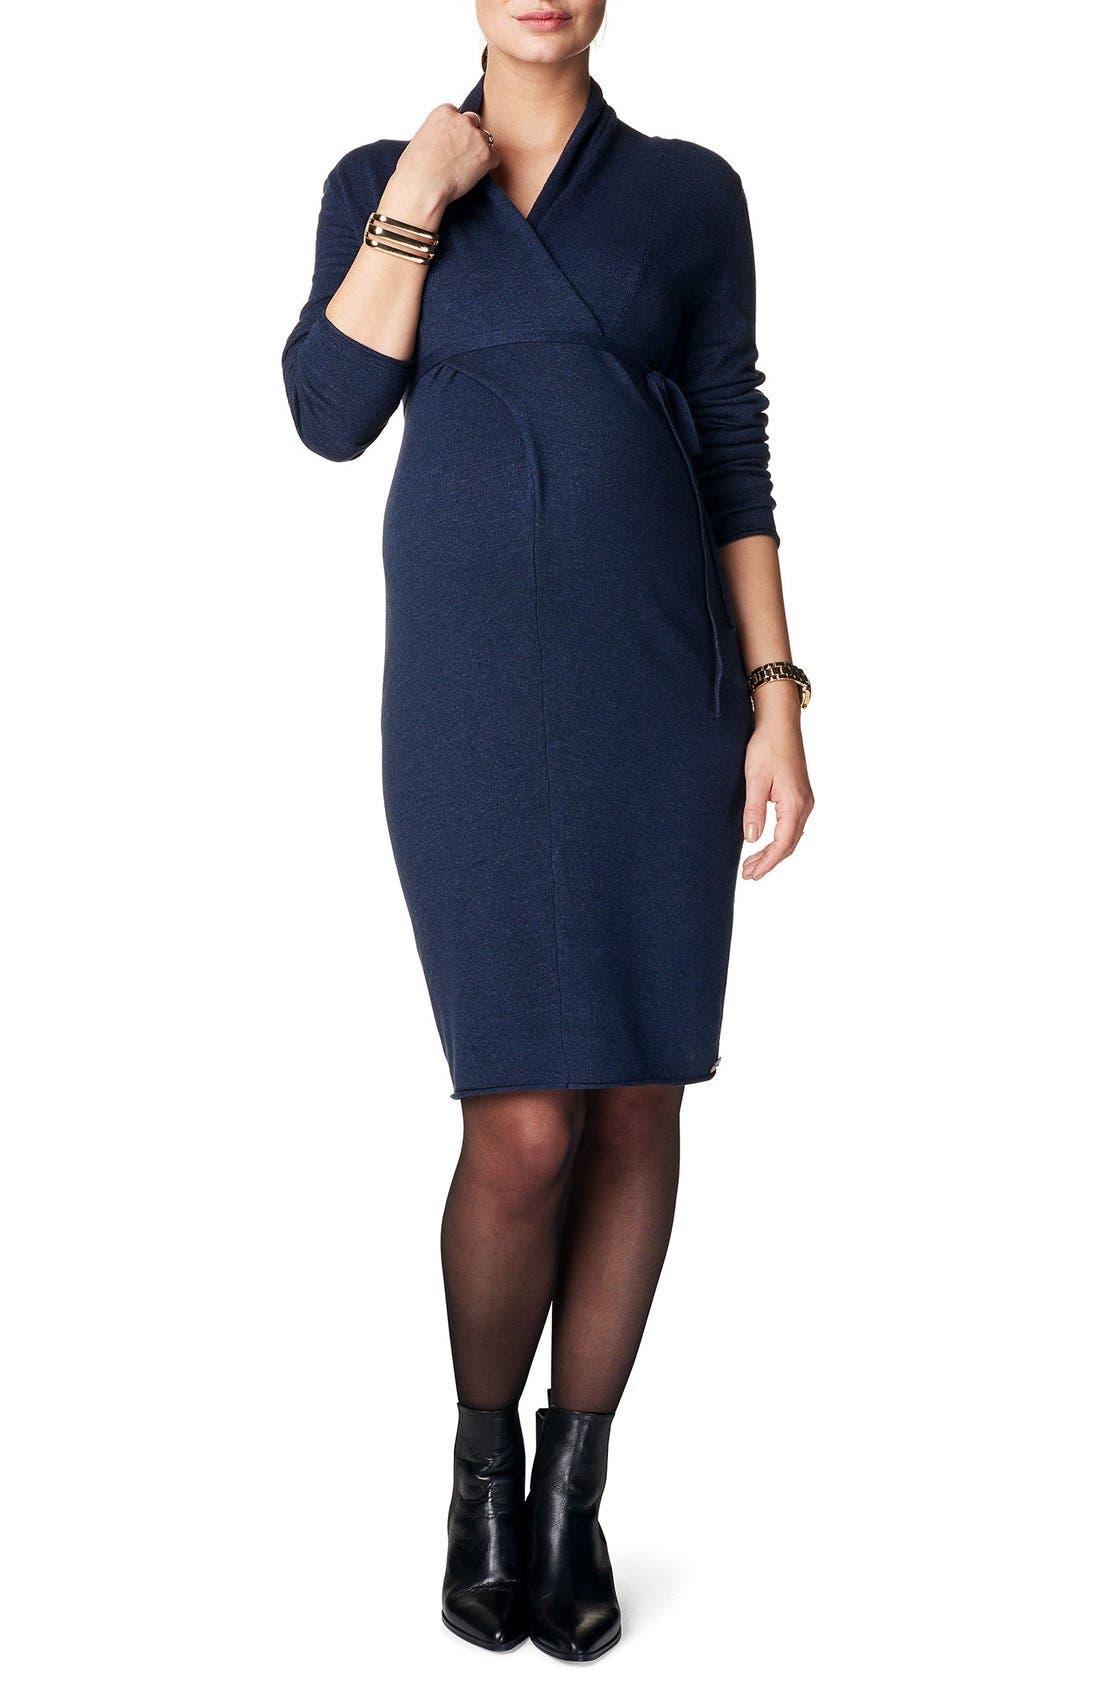 NOPPIES,                             Zara Knit Maternity Sweater Dress,                             Main thumbnail 1, color,                             410